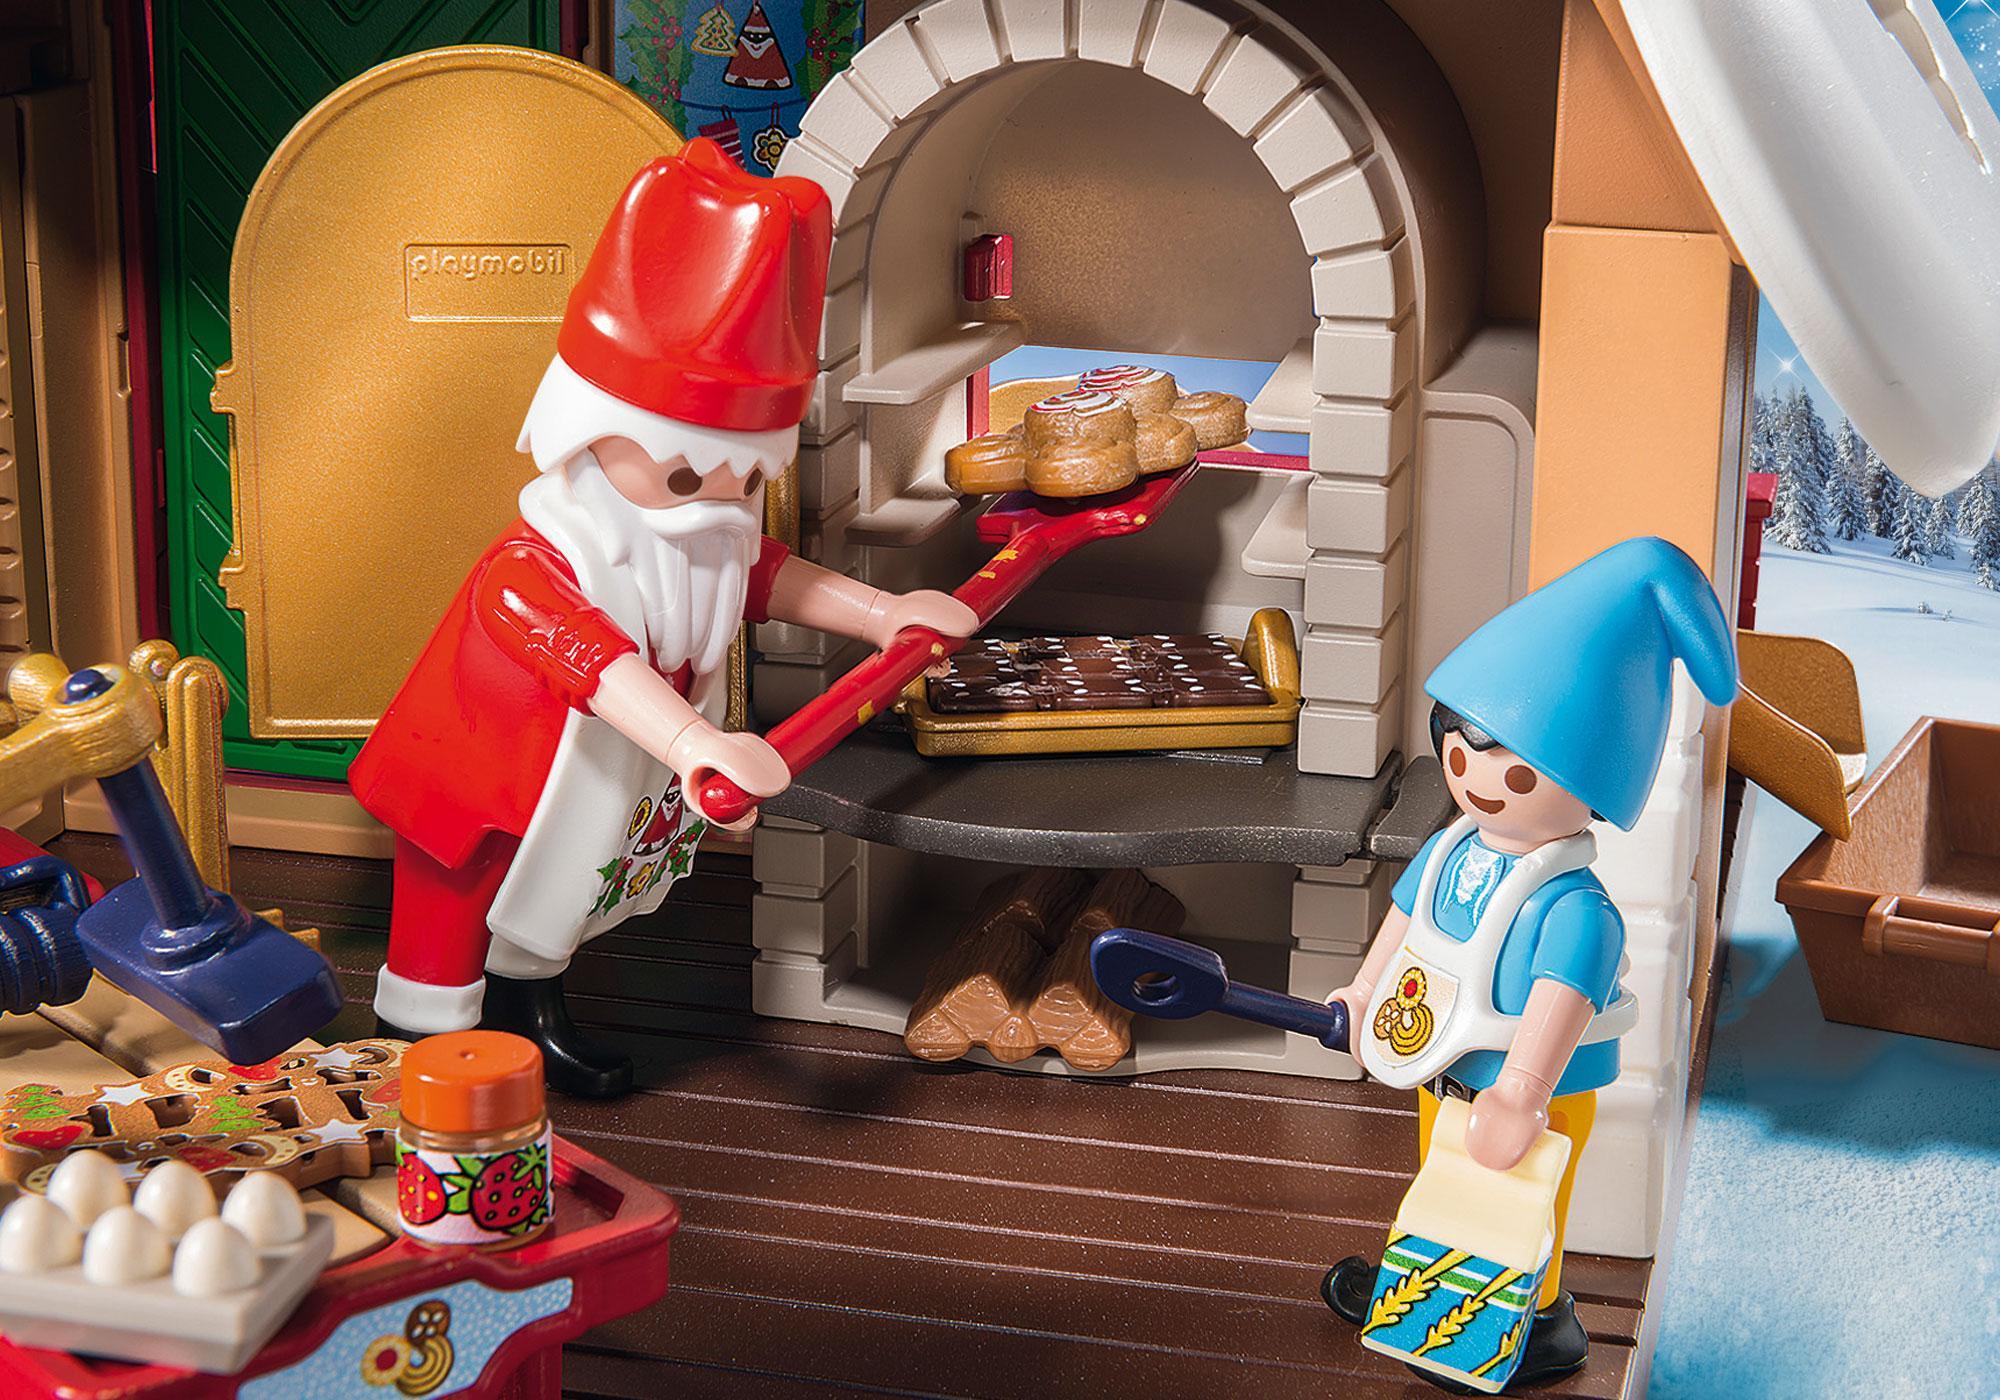 http://media.playmobil.com/i/playmobil/9493_product_extra1/Julebageri med småkageskærere